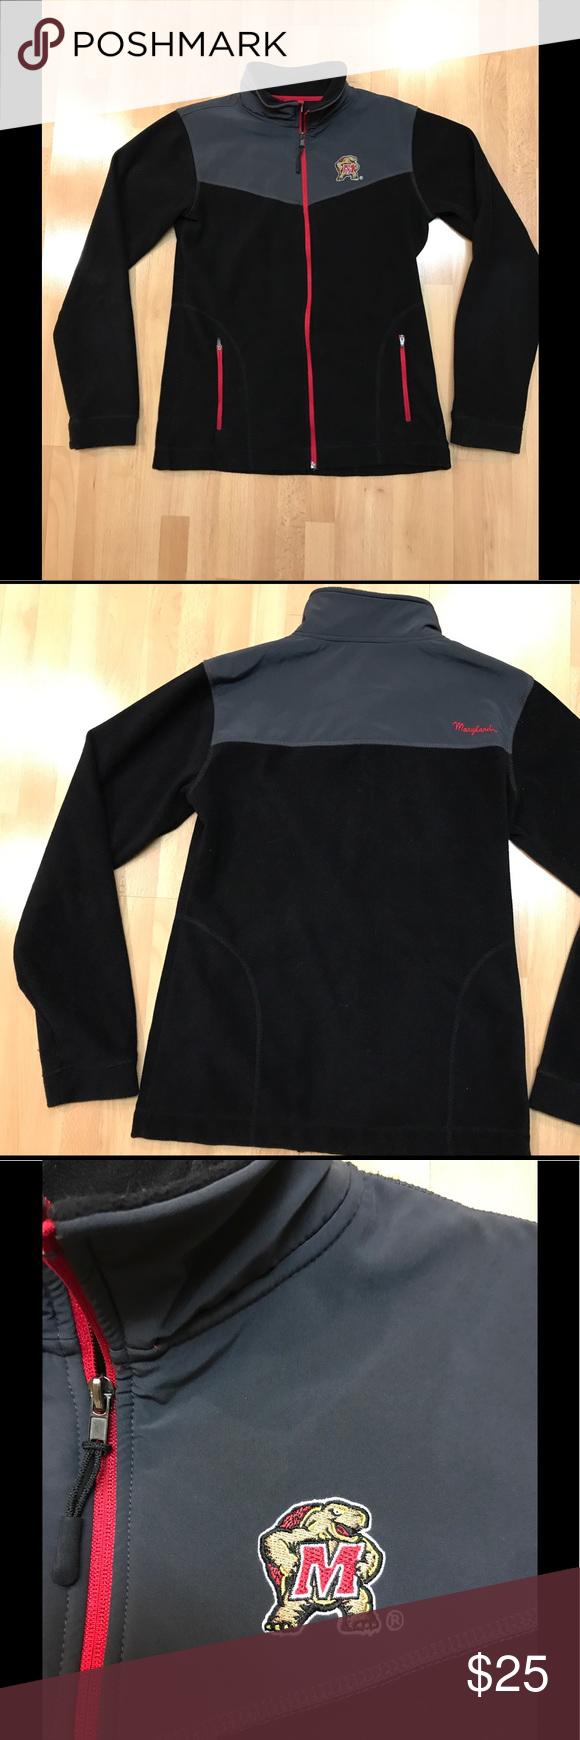 University of maryland fleece jacket euc university of maryland